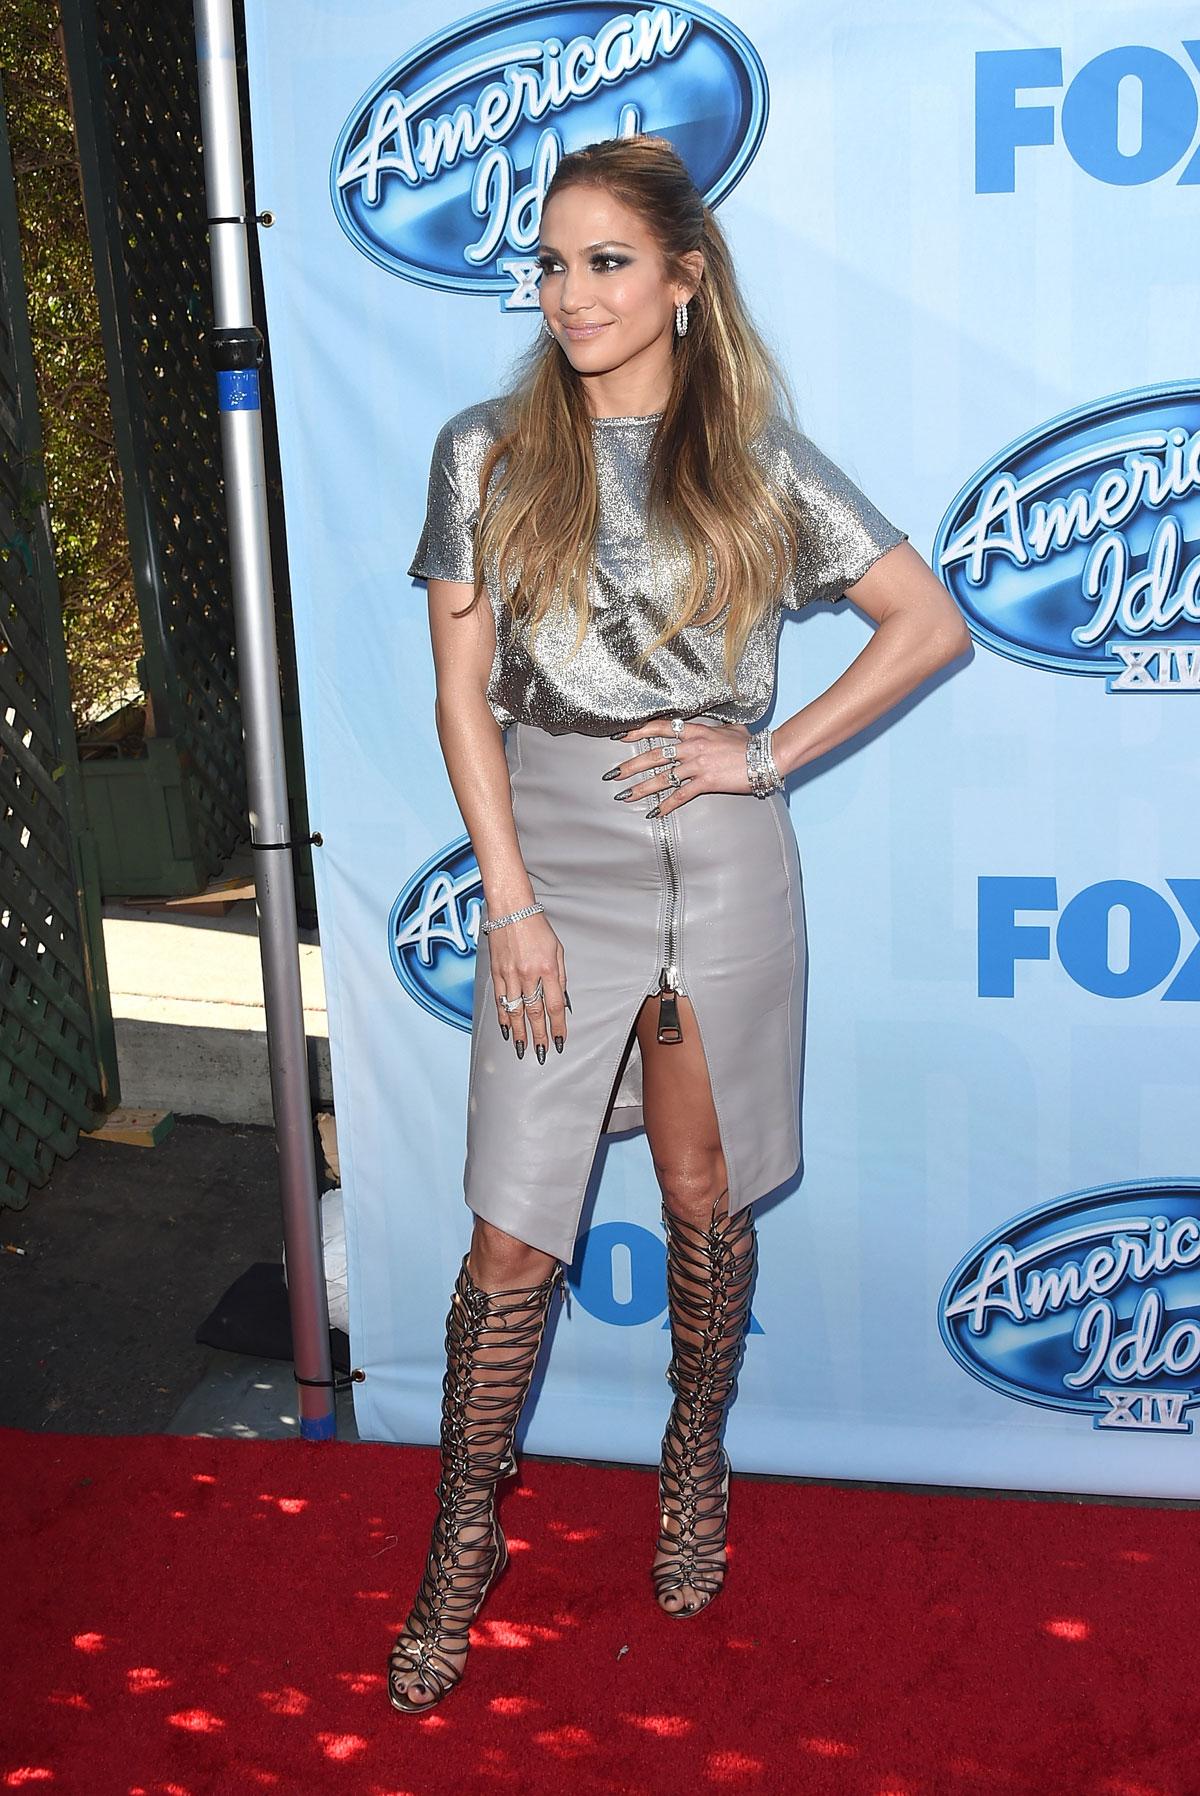 Jennifer Lopez attends American Idol XIV Red Carpet Event